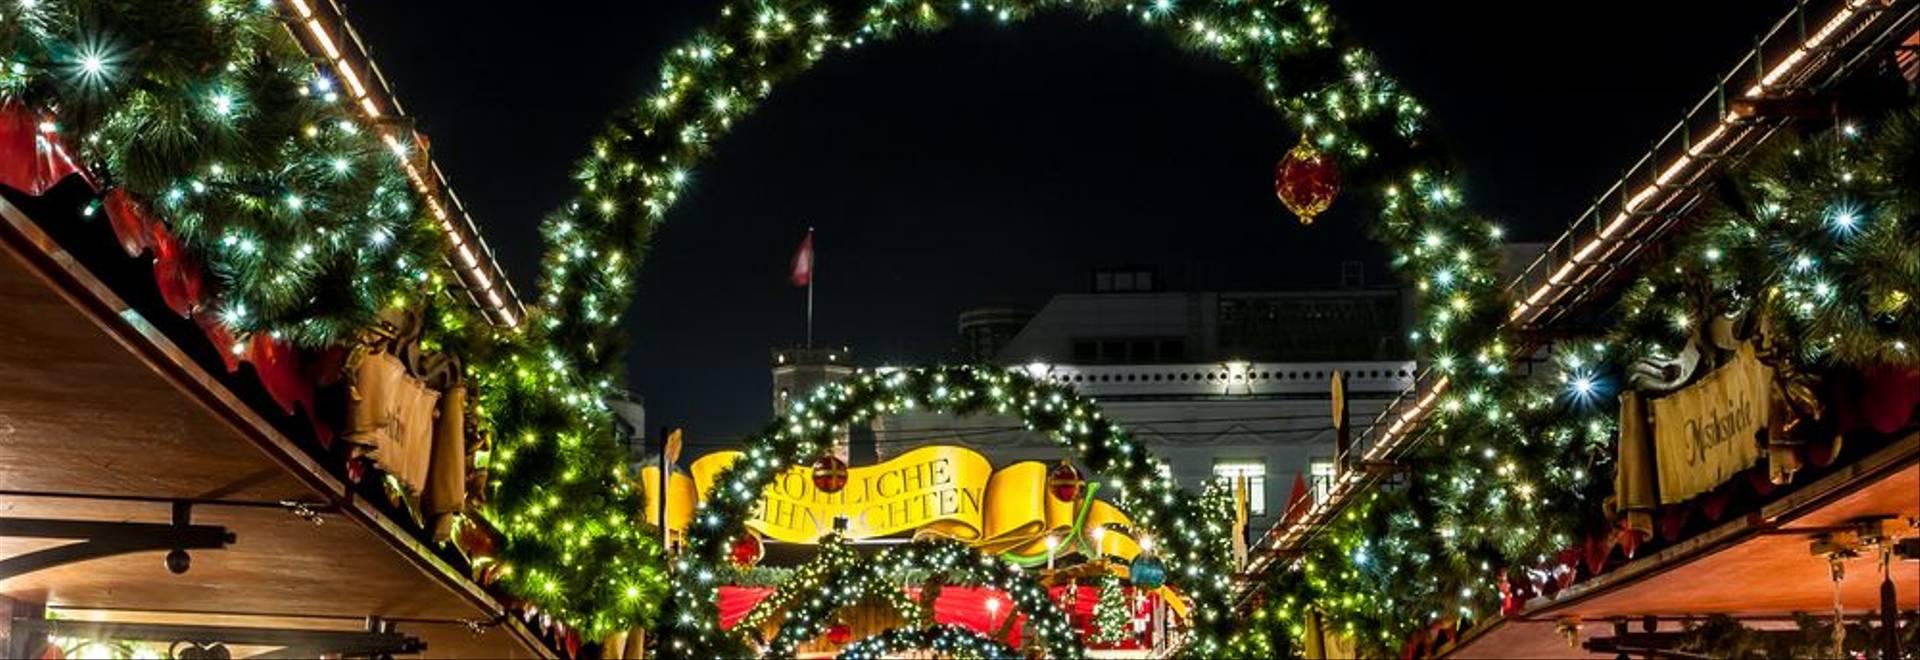 shutterstock_128757101 Hamburg Christmas Market.jpg